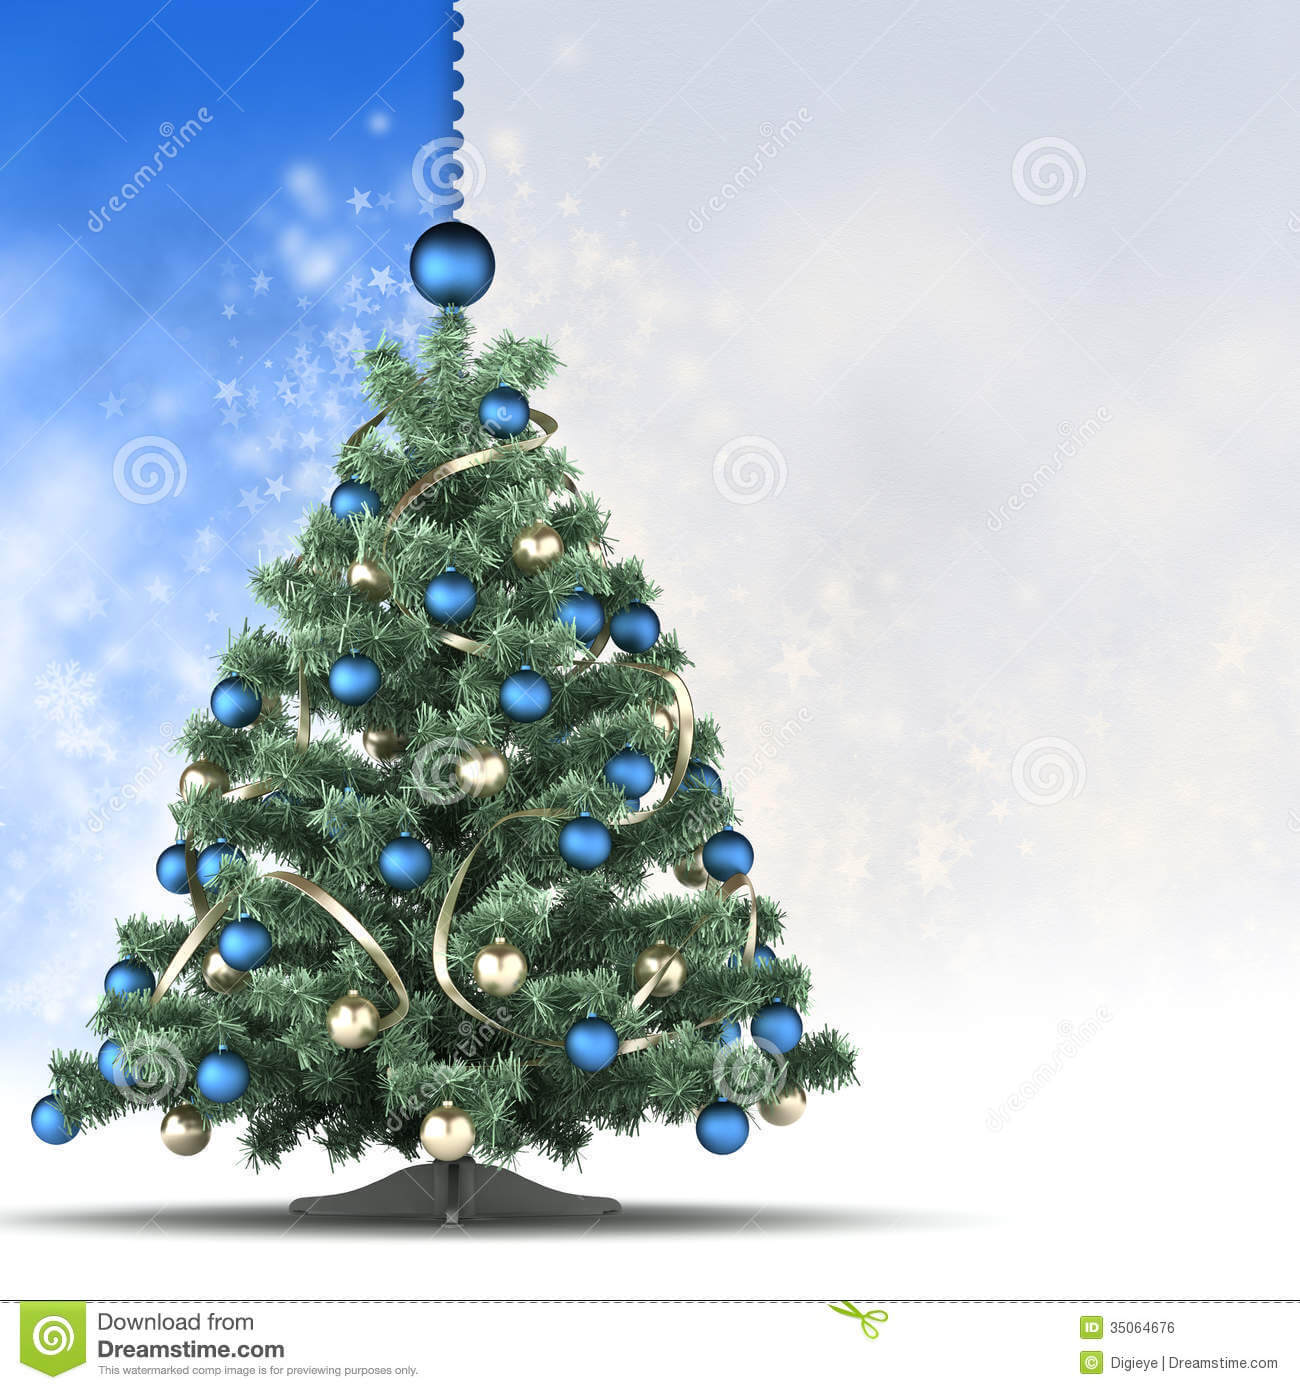 Christmas Card Template – Xmas Tree And Blank Space For Text For Blank Christmas Card Templates Free